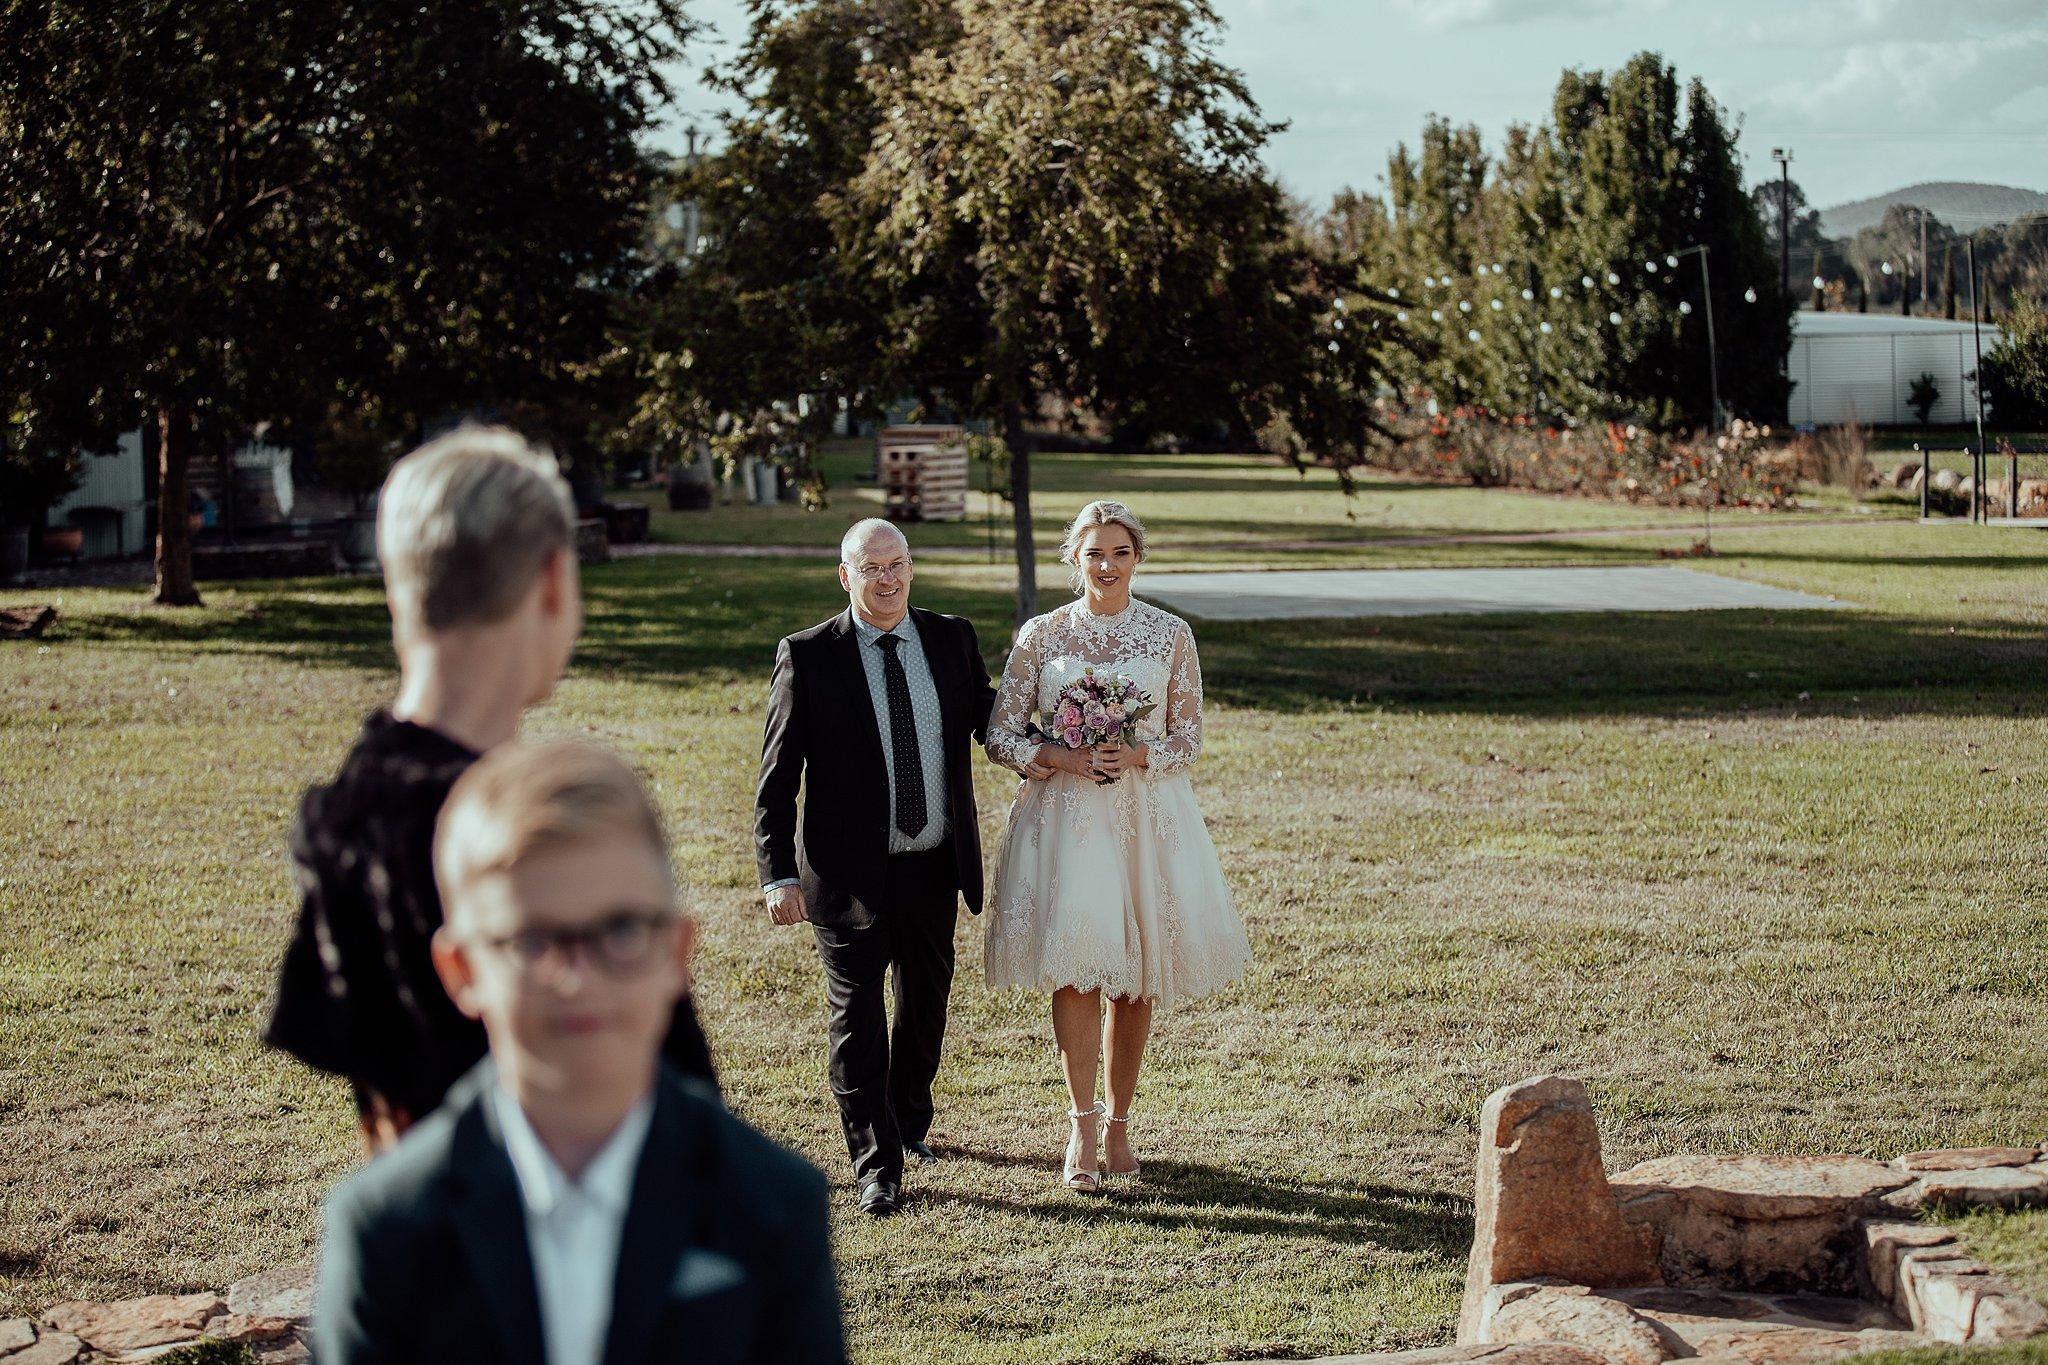 mickalathomas_puremacphotography_weddingphotographer_couplephotographer_Sheppartonphotographer_3423.jpg